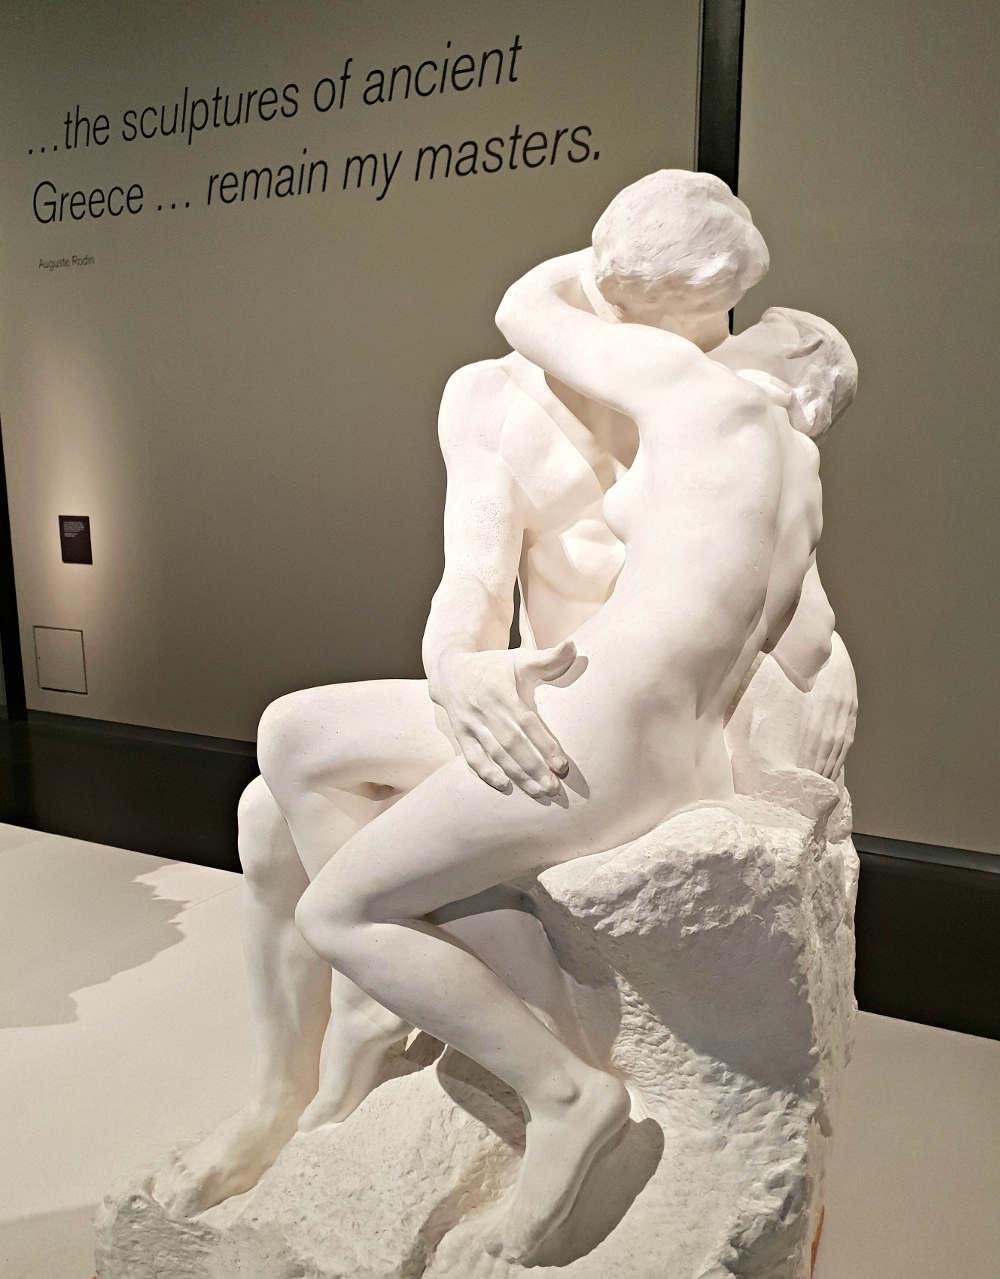 Erotic London, Erotic Art London, Erotic Art in London, Rodin, Tate. The Kiss